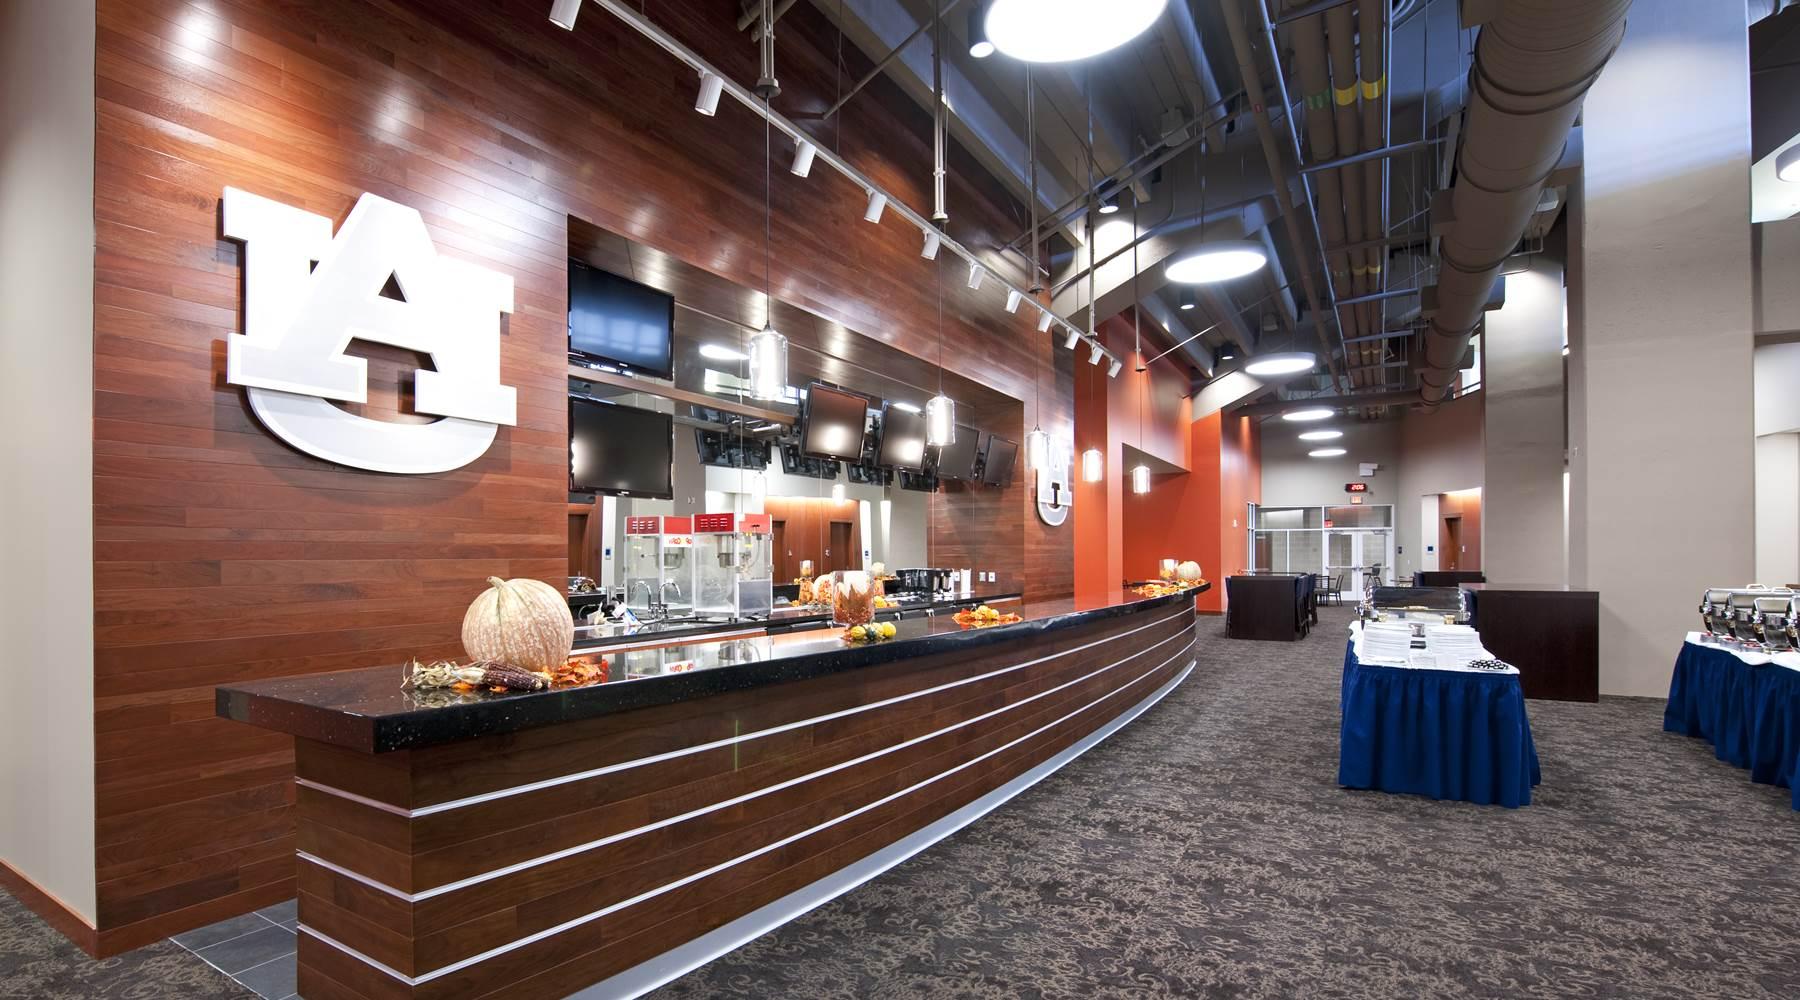 Auburn Arena hospitality area